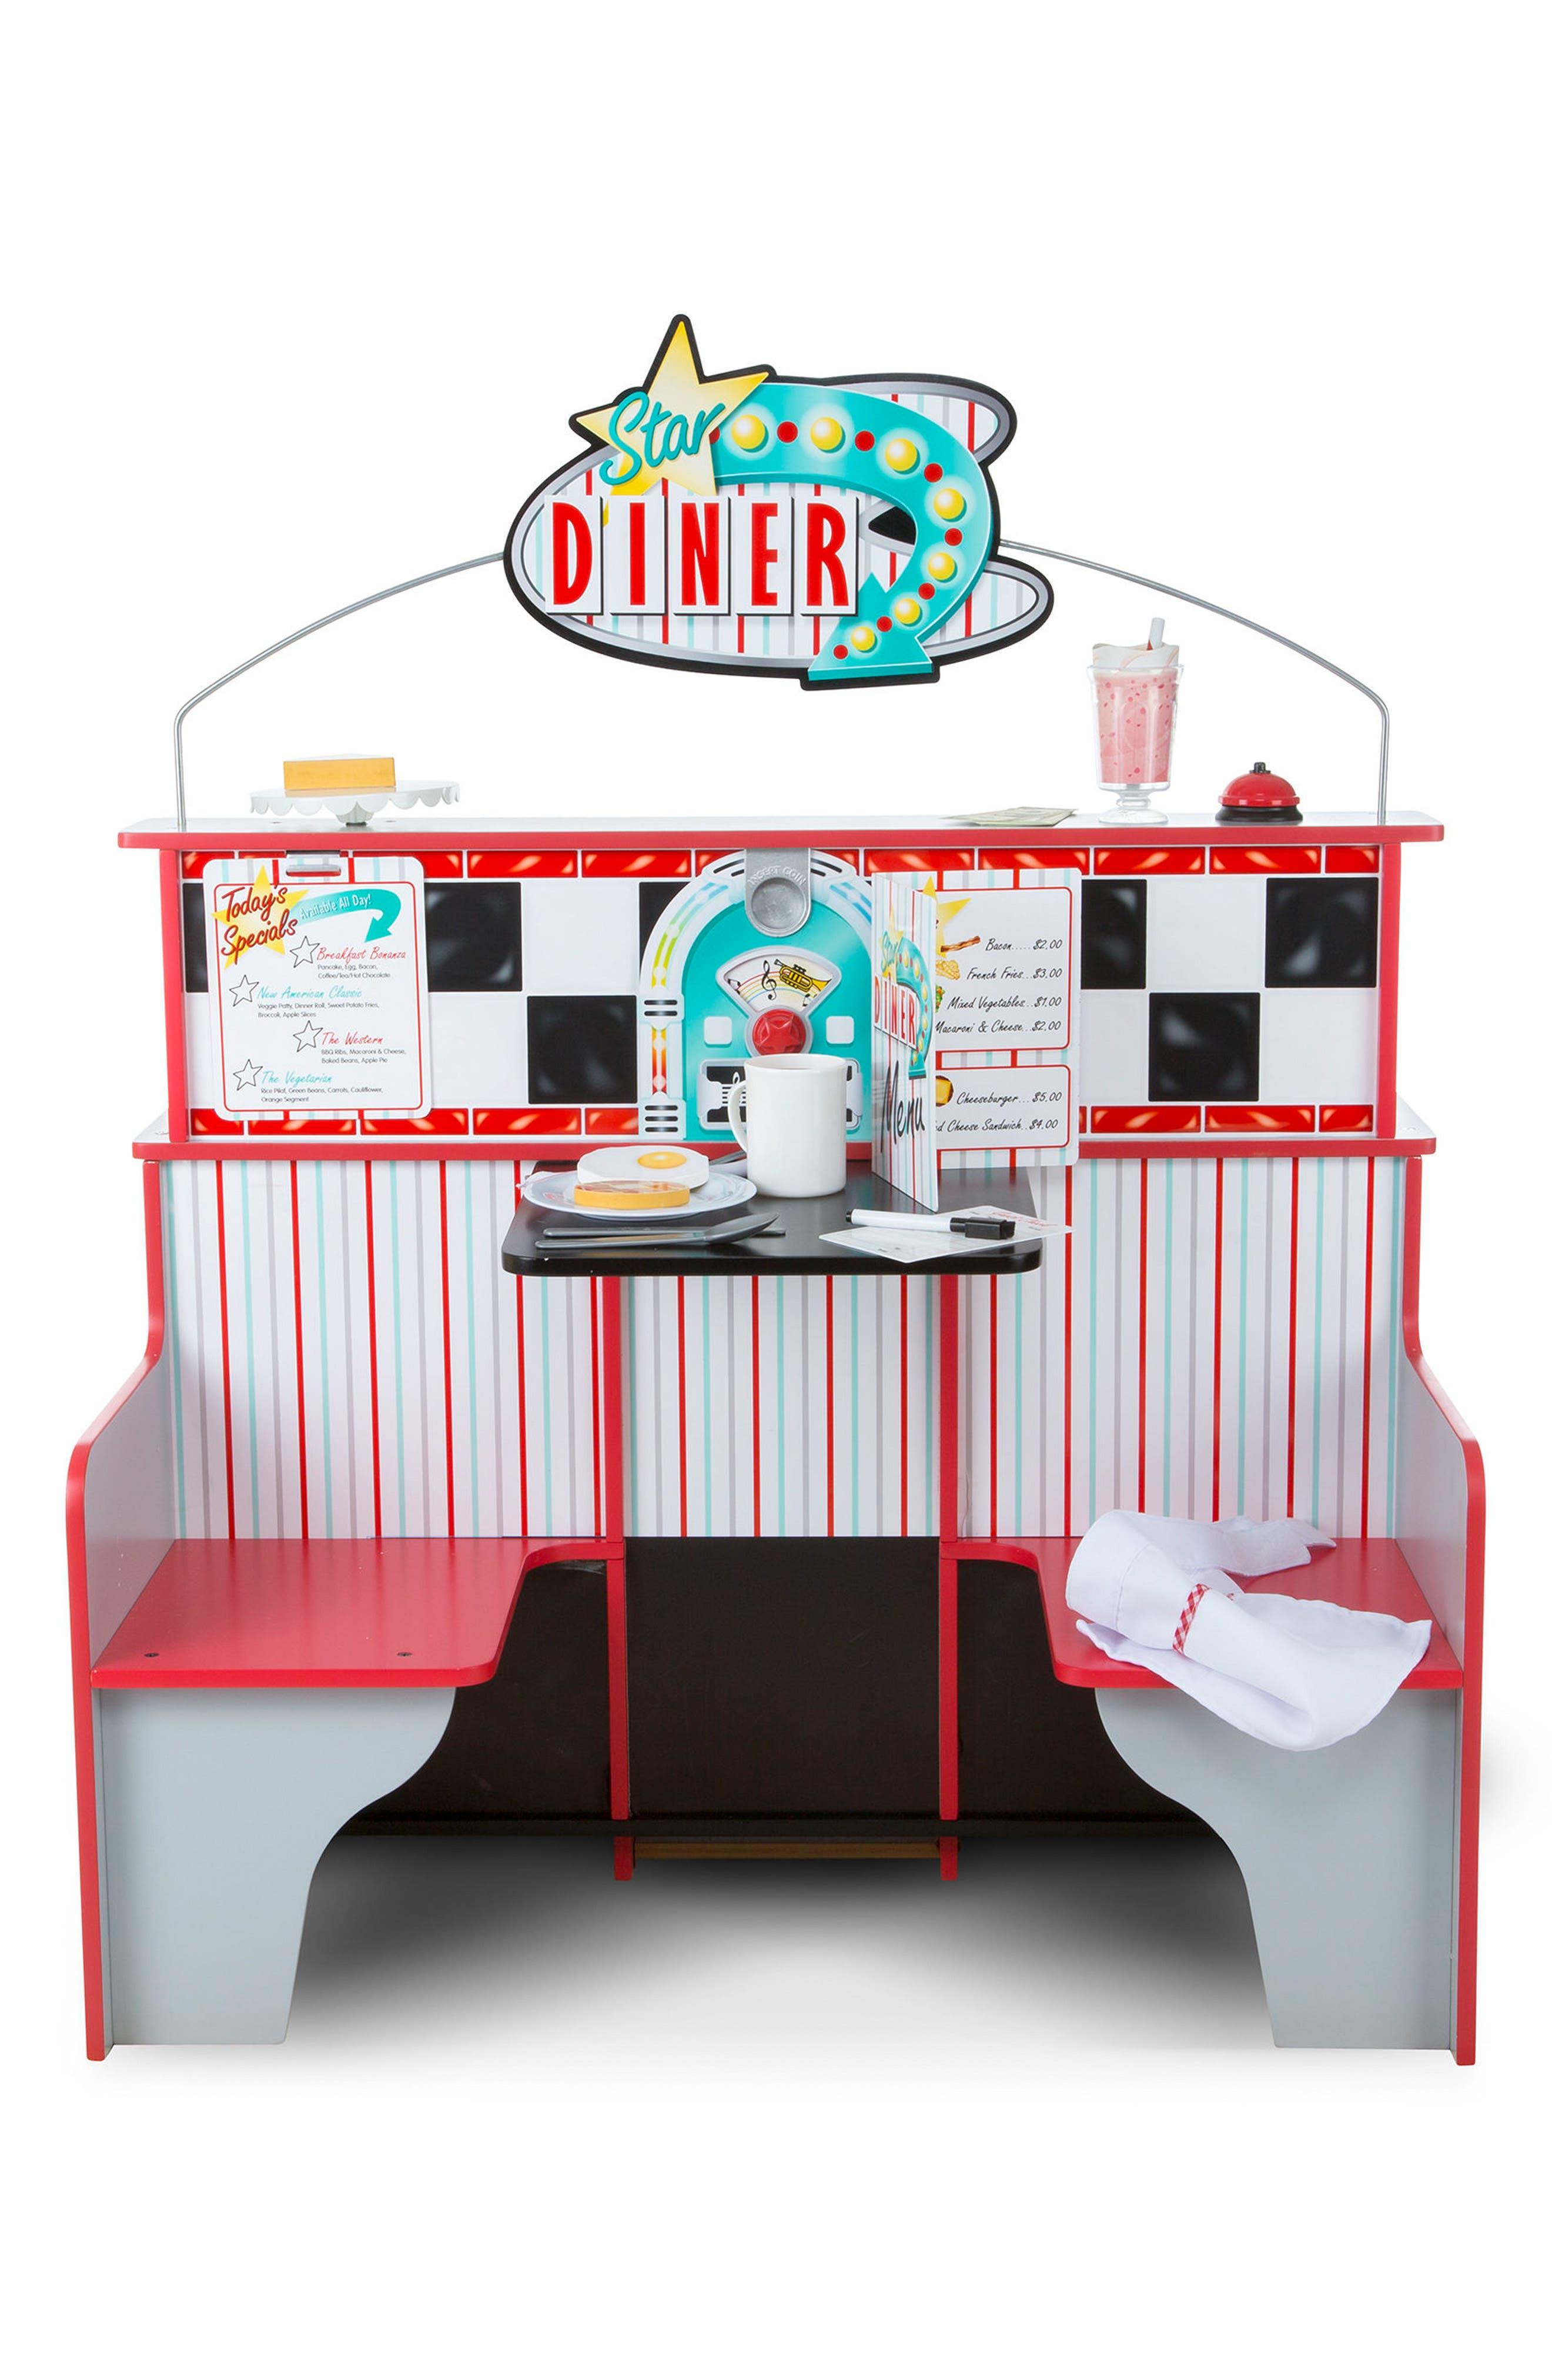 Star Diner Play Scene,                             Main thumbnail 1, color,                             WHITE